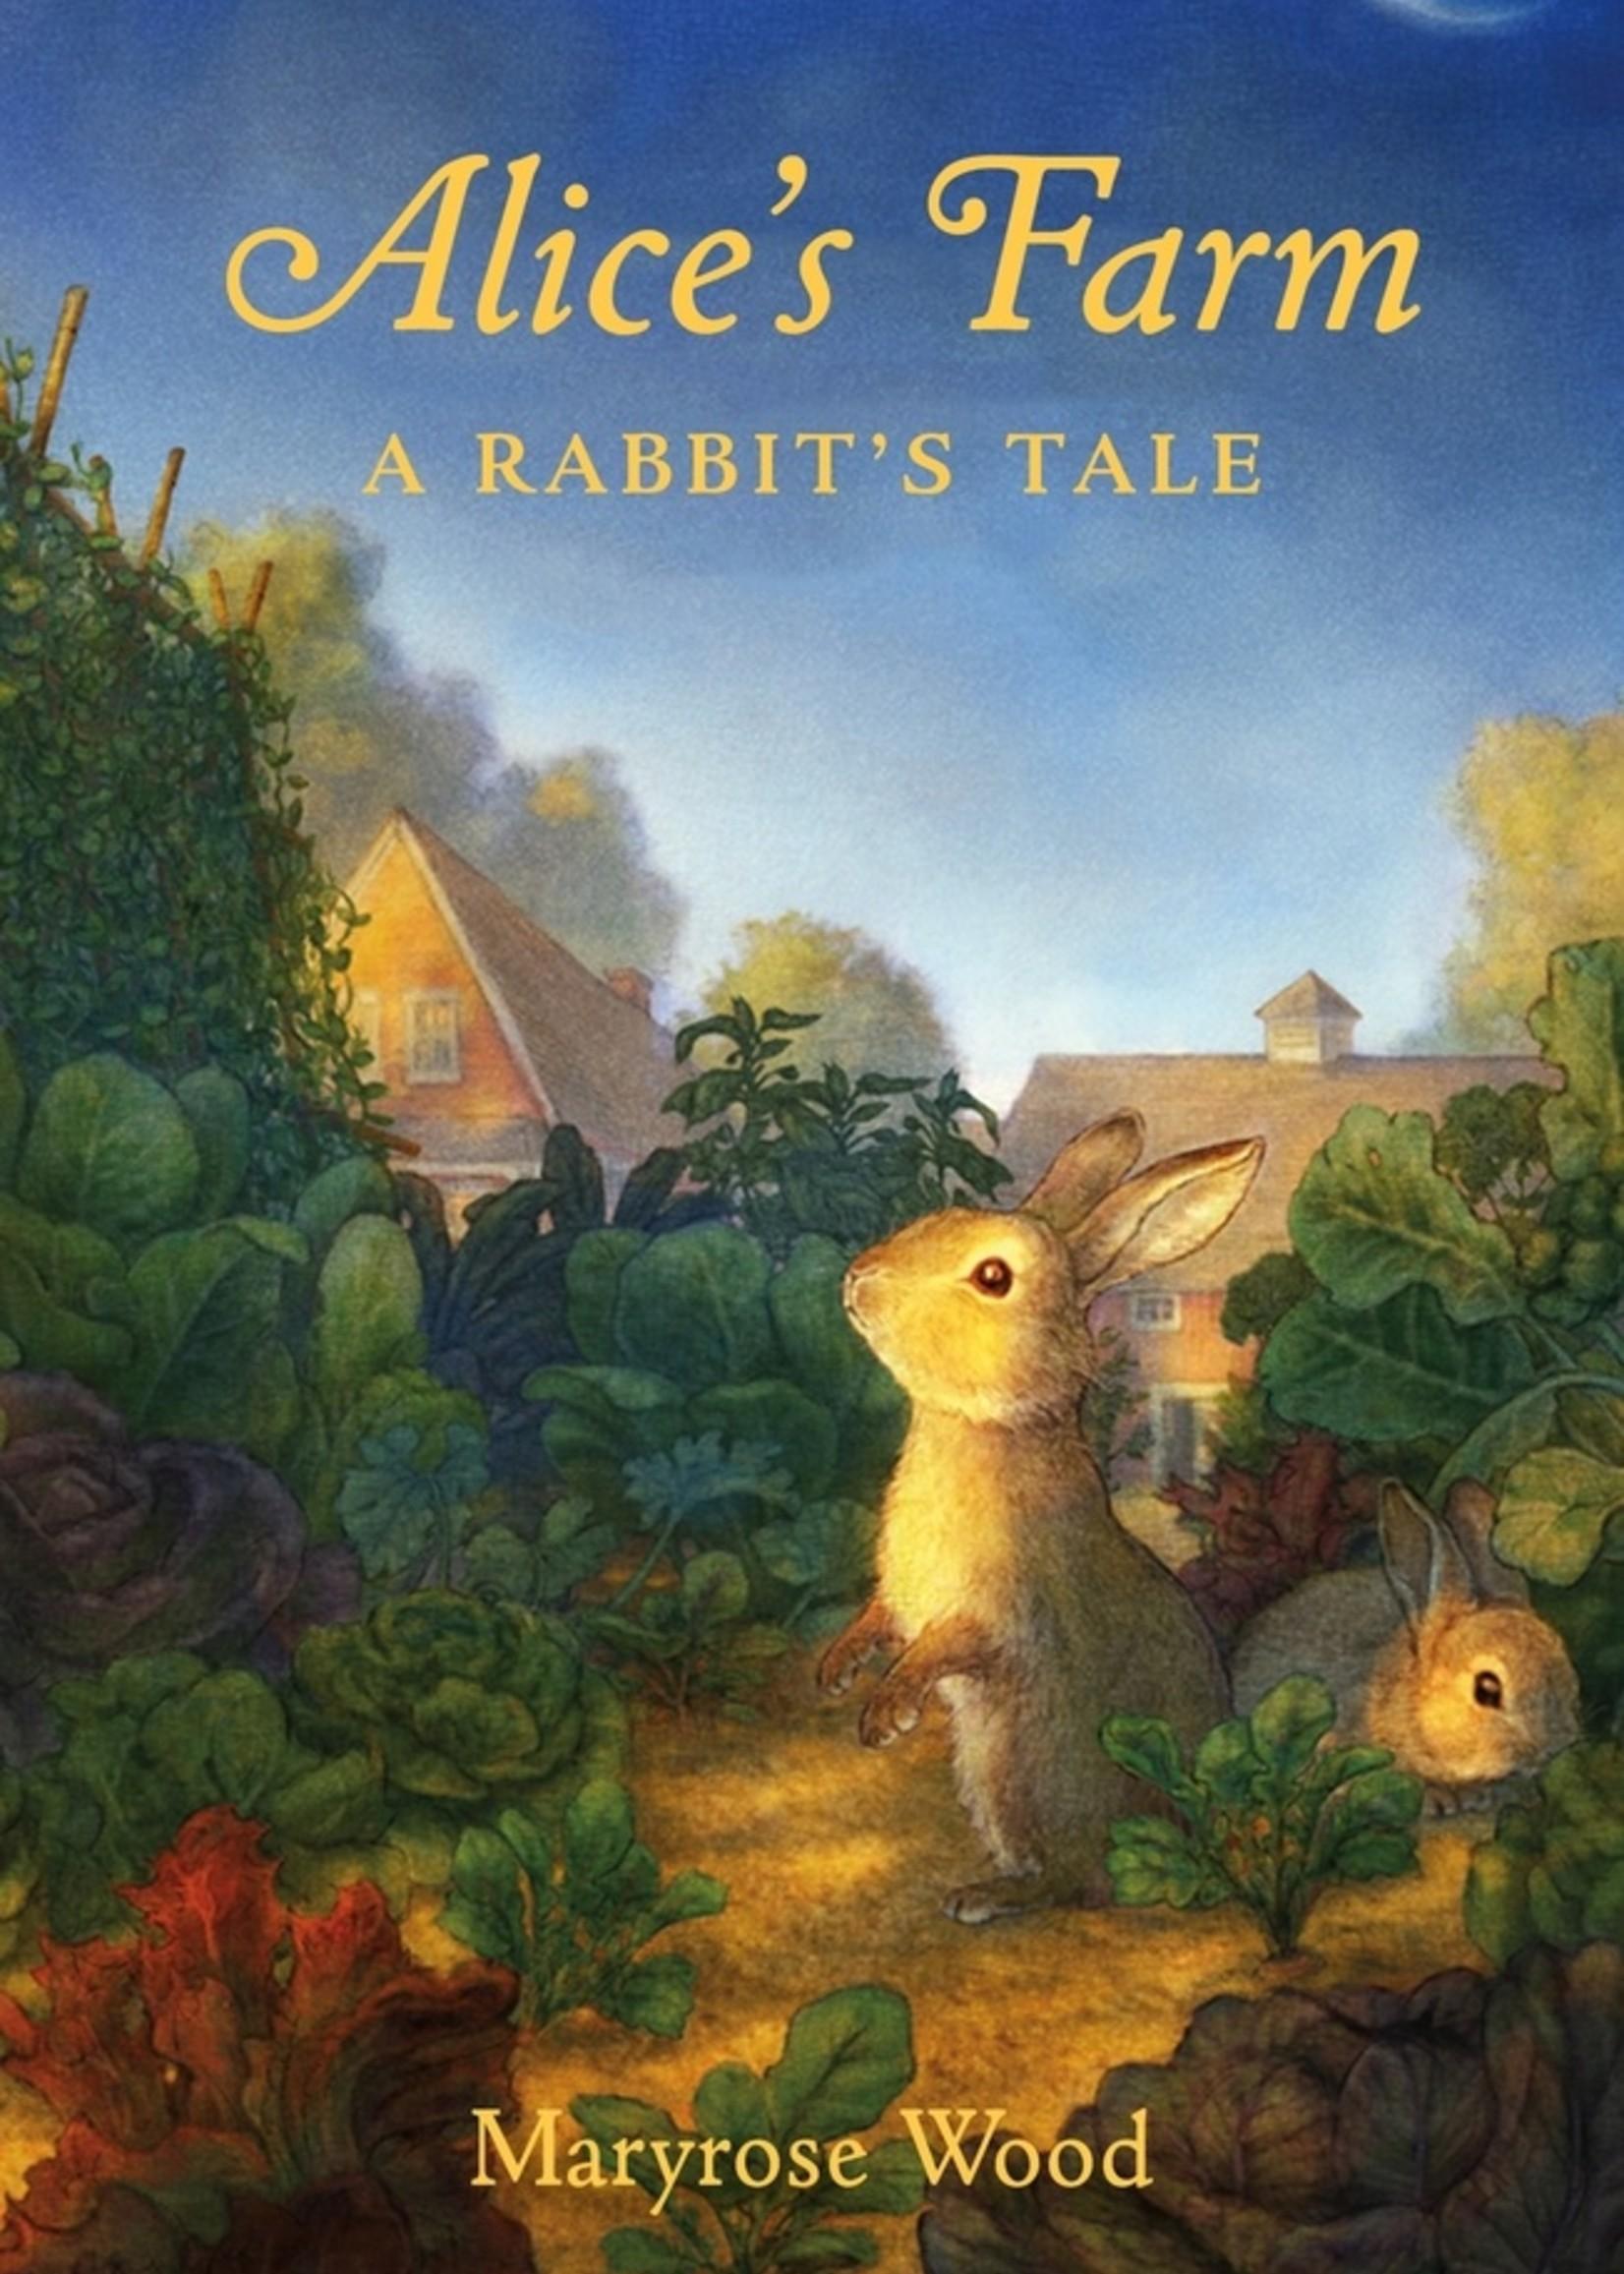 Alice's Farm: A Rabbit's Tale - Hardcover